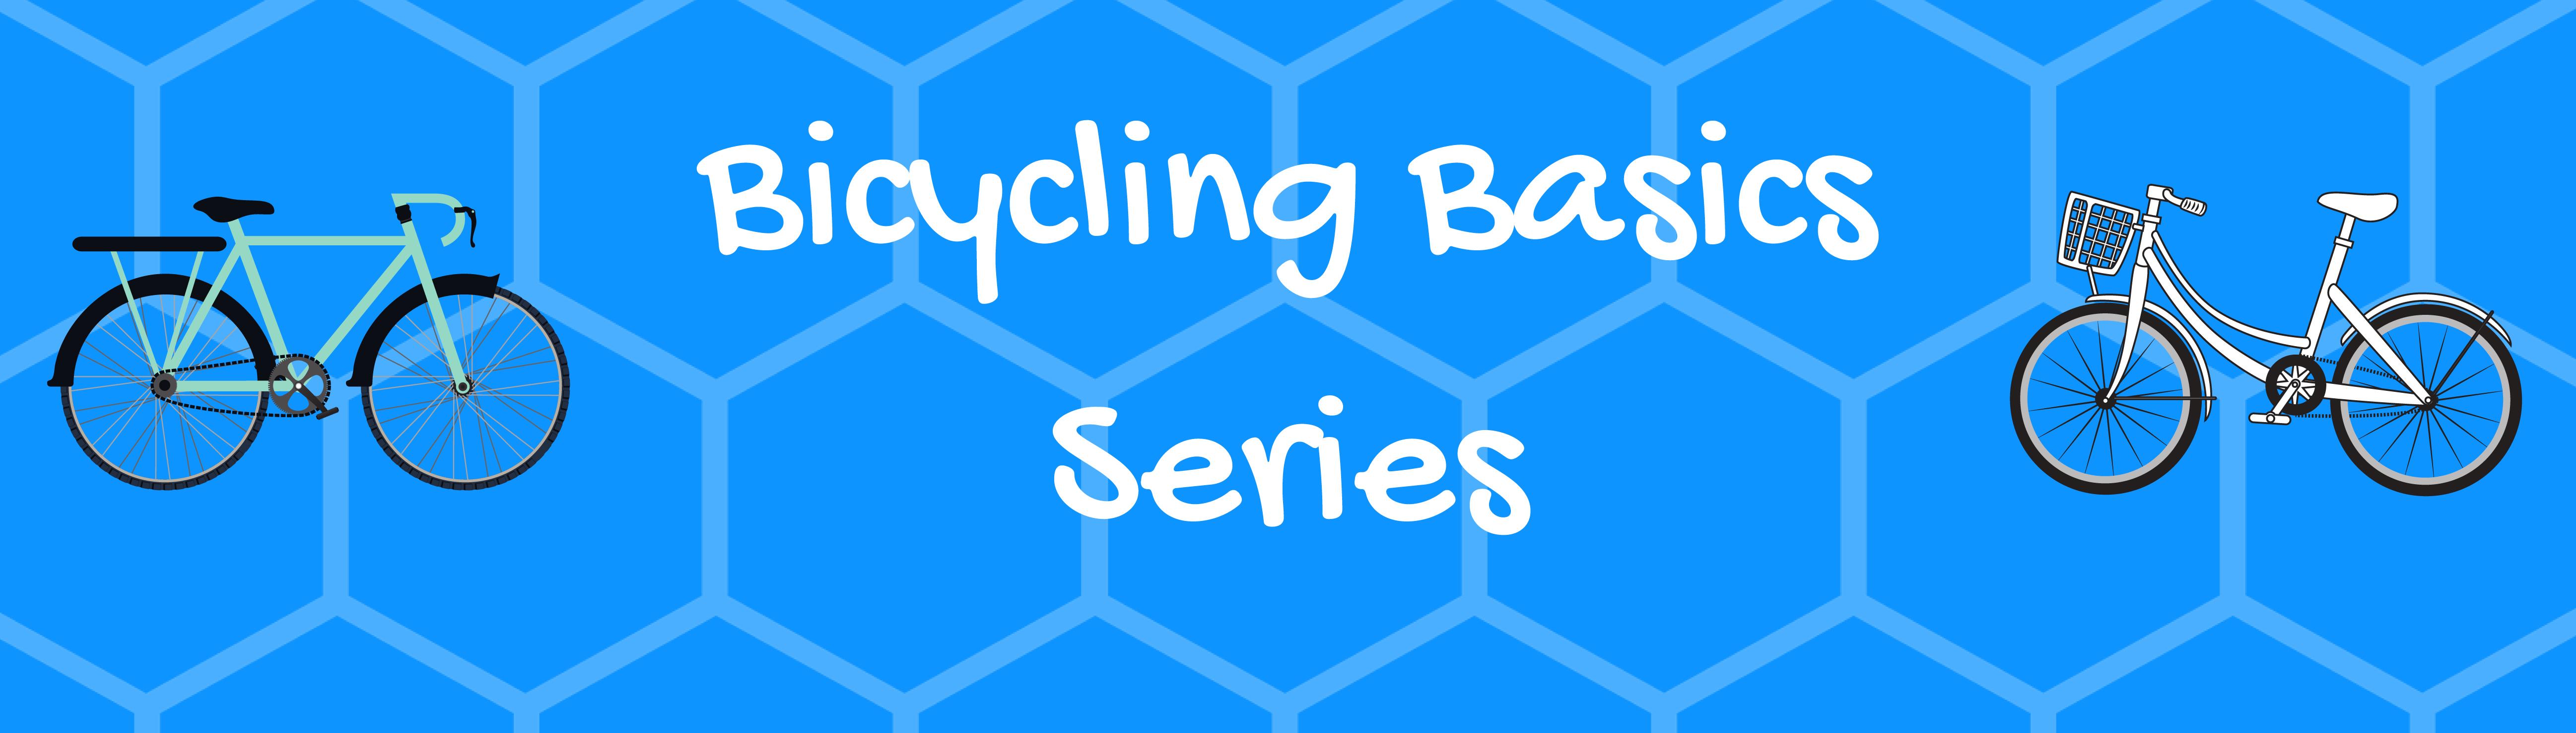 Copy of BicyclingBasics